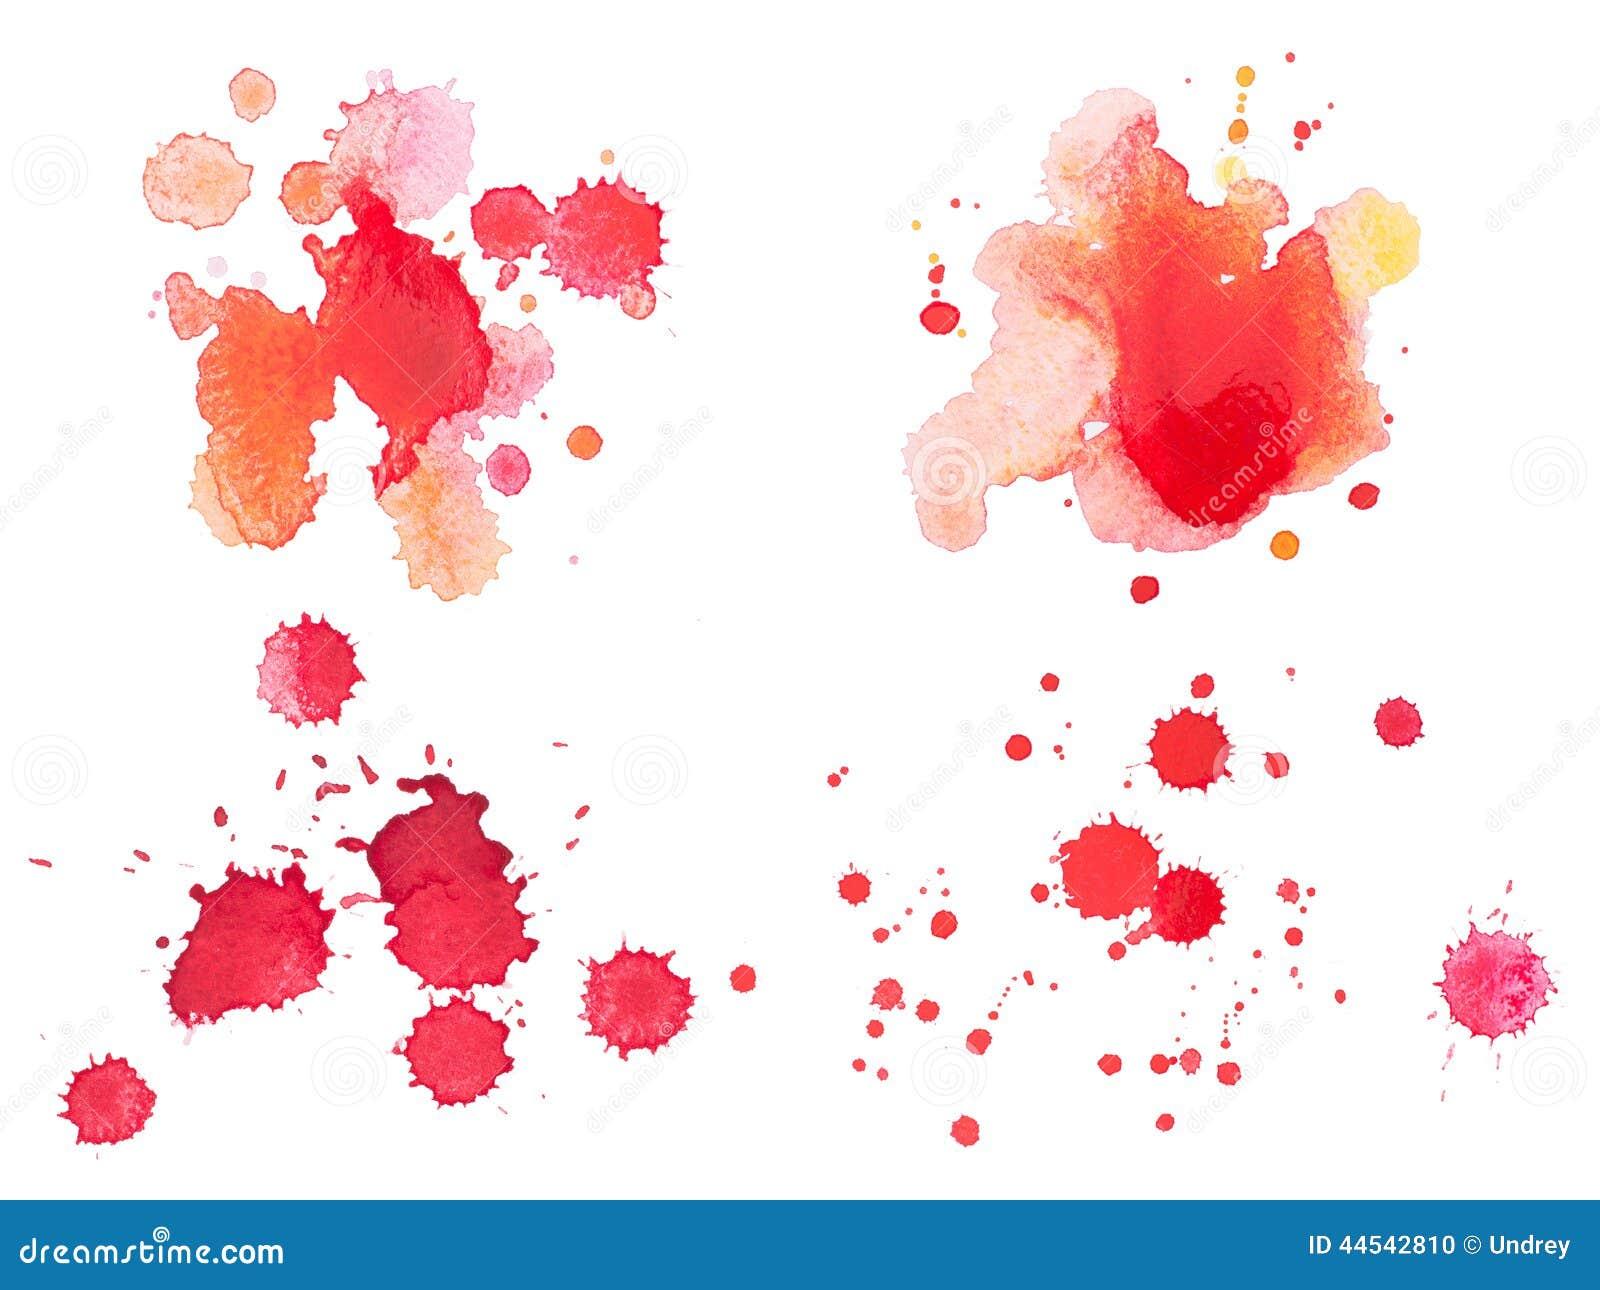 abstract watercolor aquarelle hand drawn red blood stock blood splatter vector download blood splatter vector images